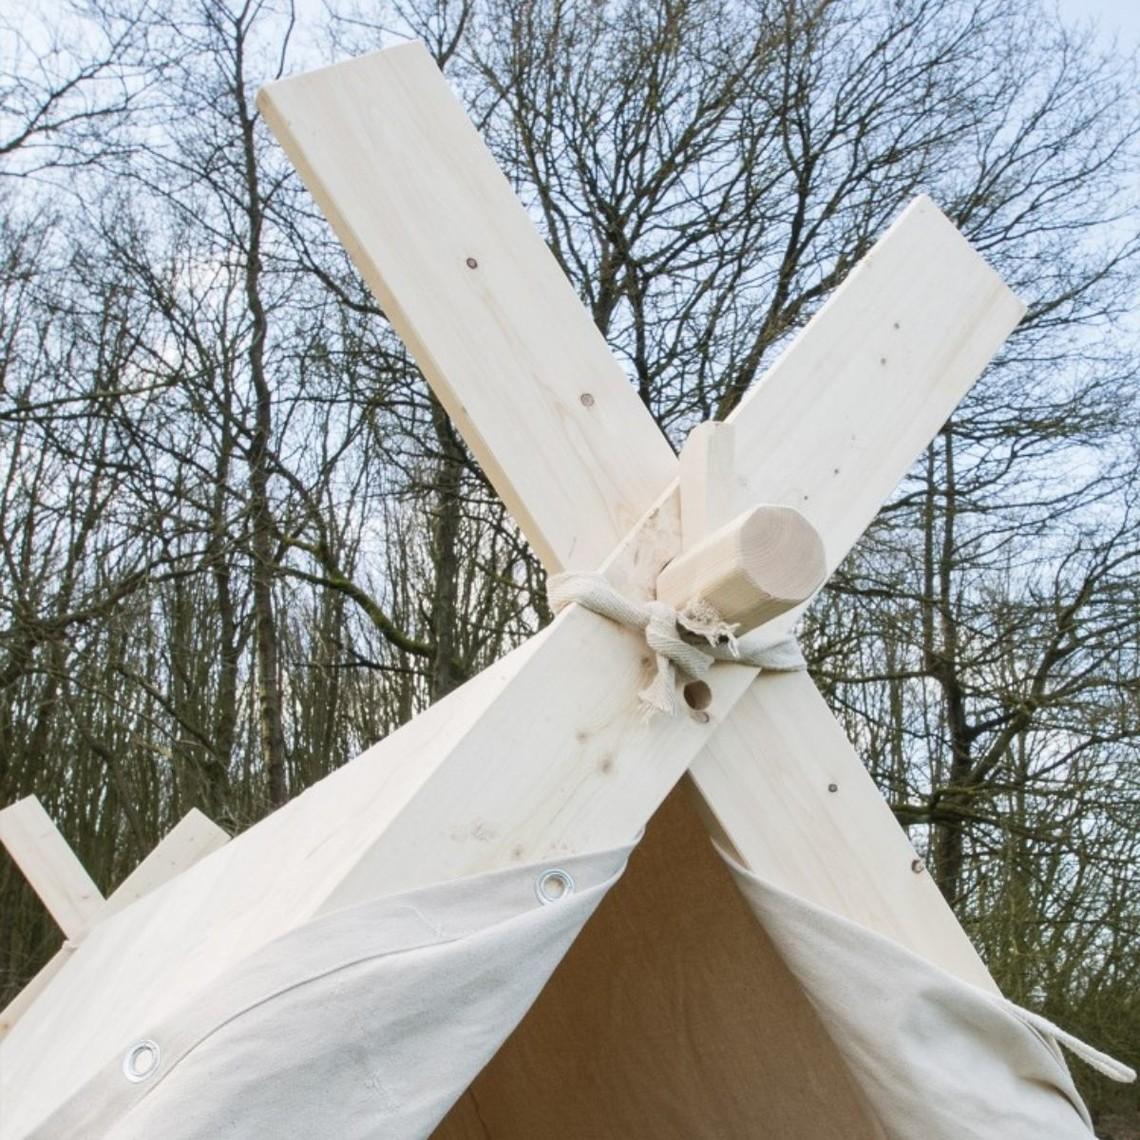 Vikingetelt 2 x 2,3 x 1,8 m uden ramme, 350 gms